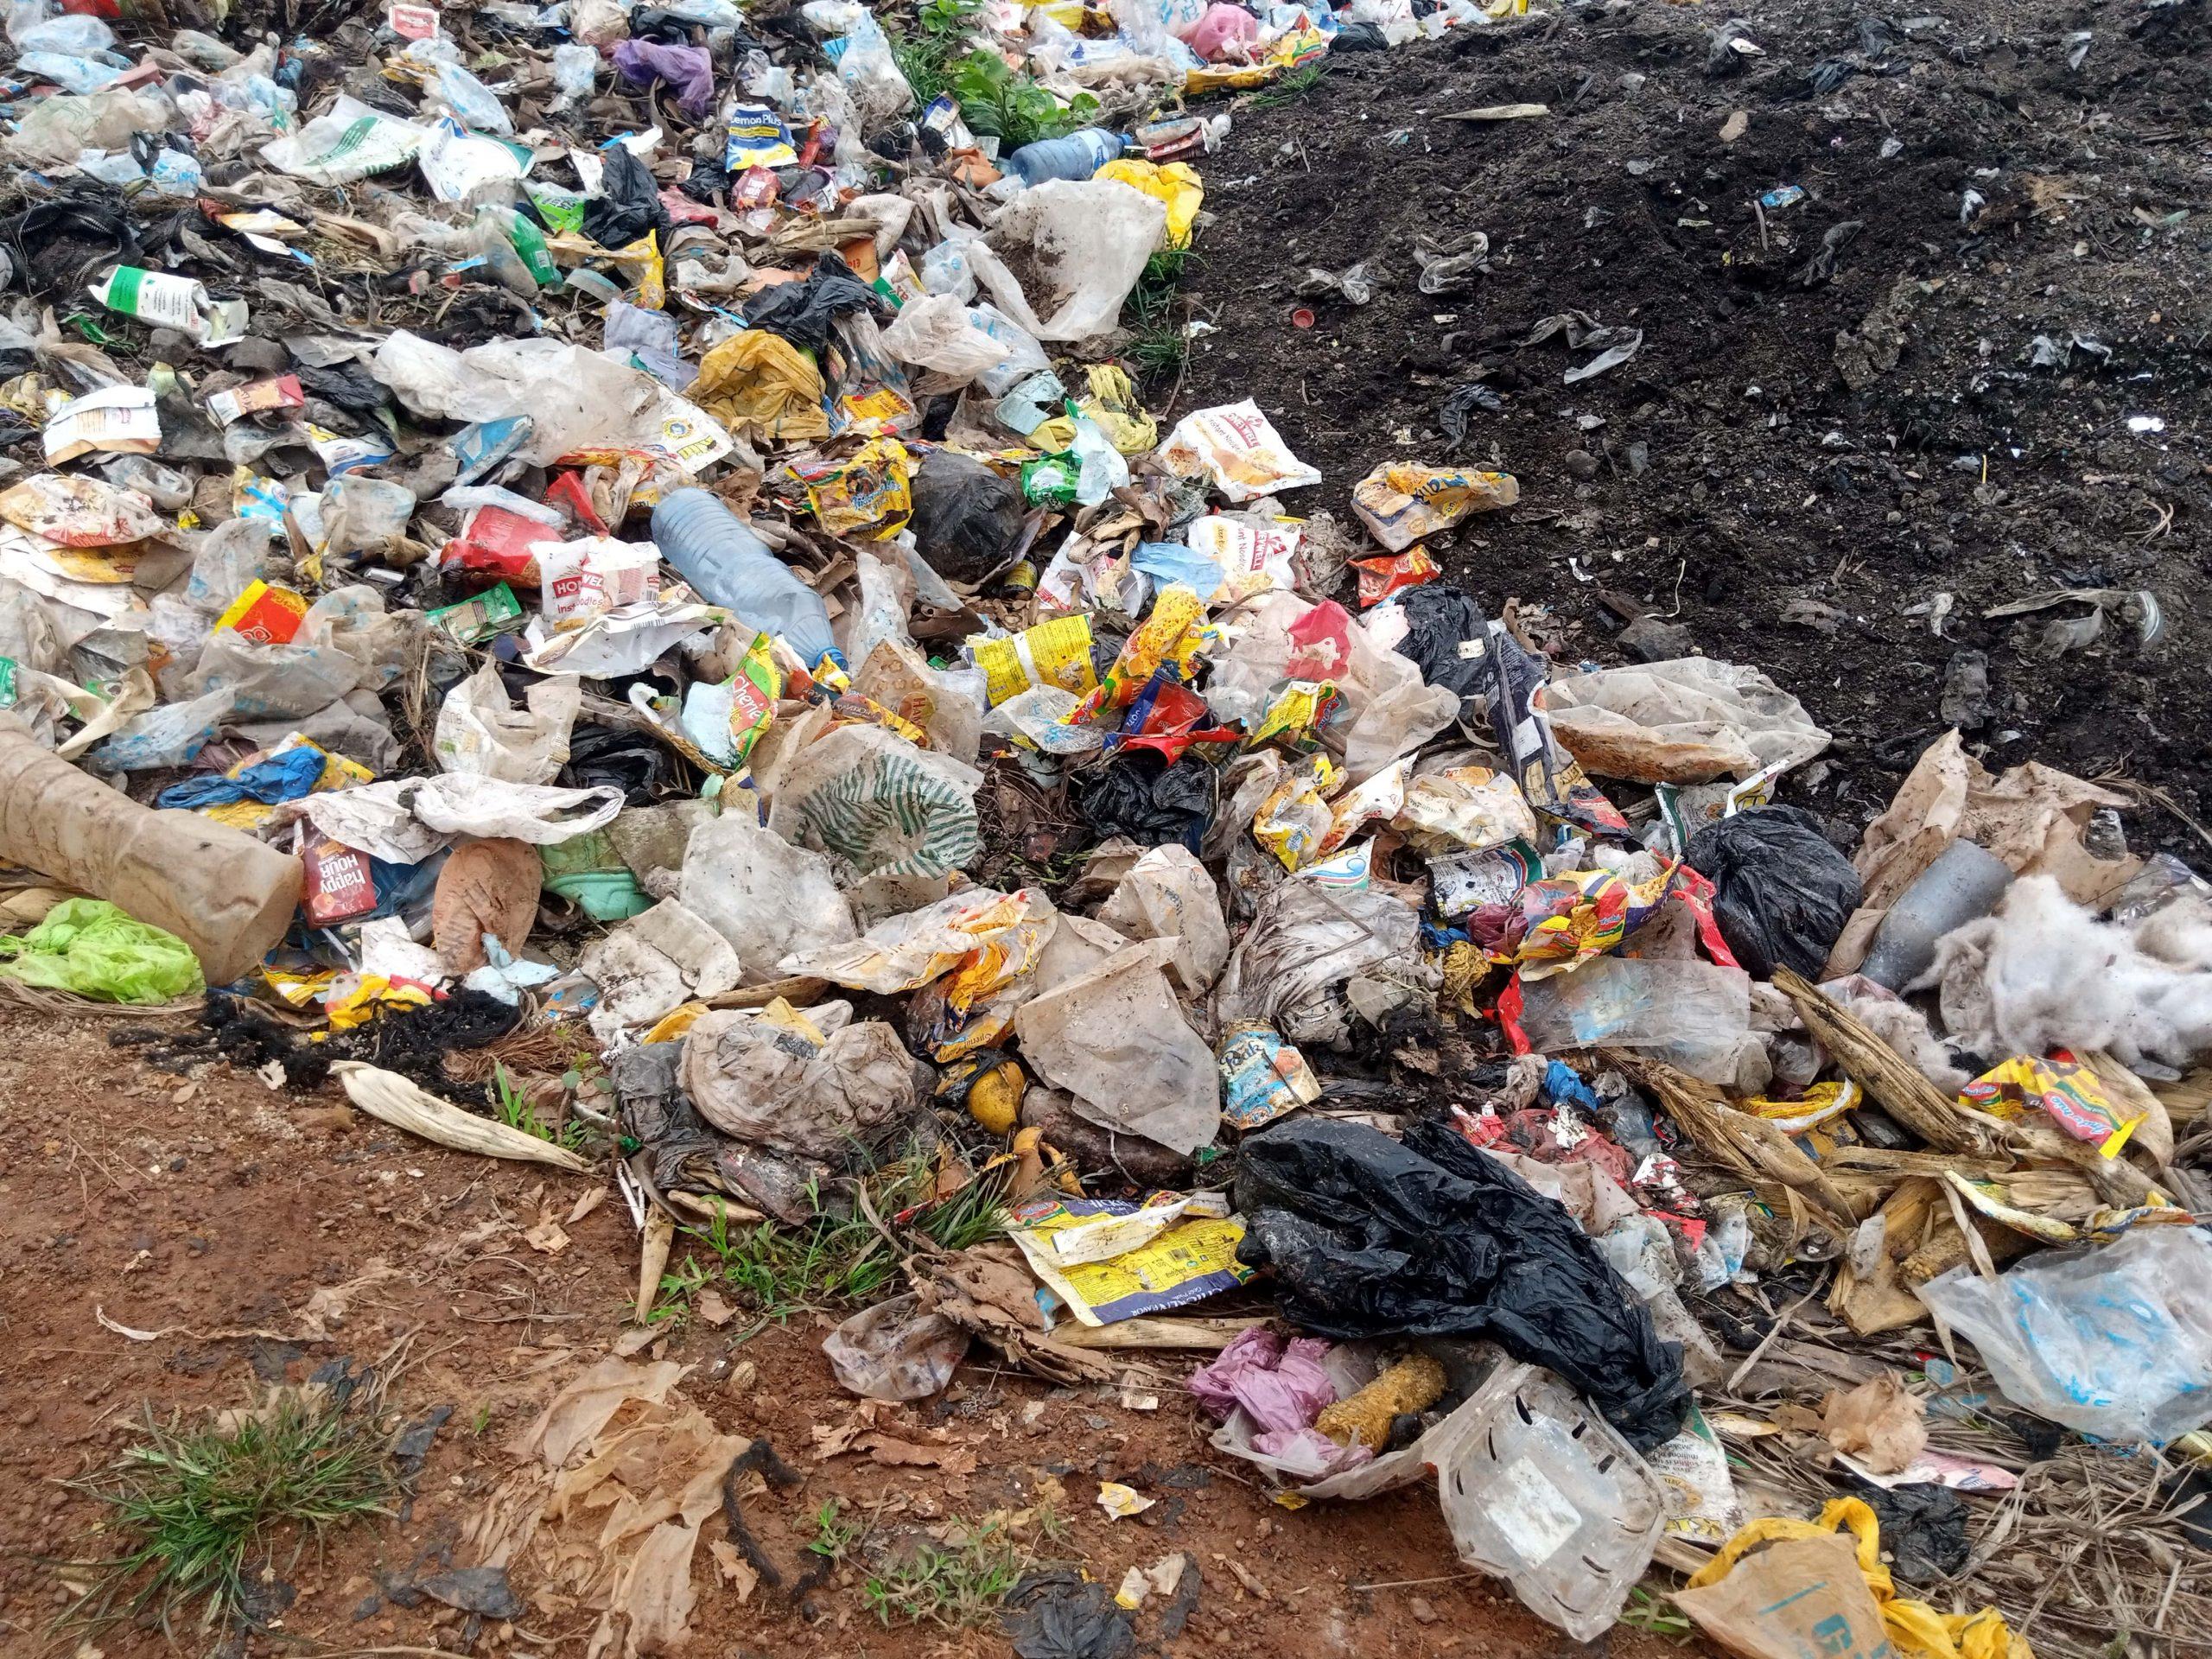 The bane of environmental hazards